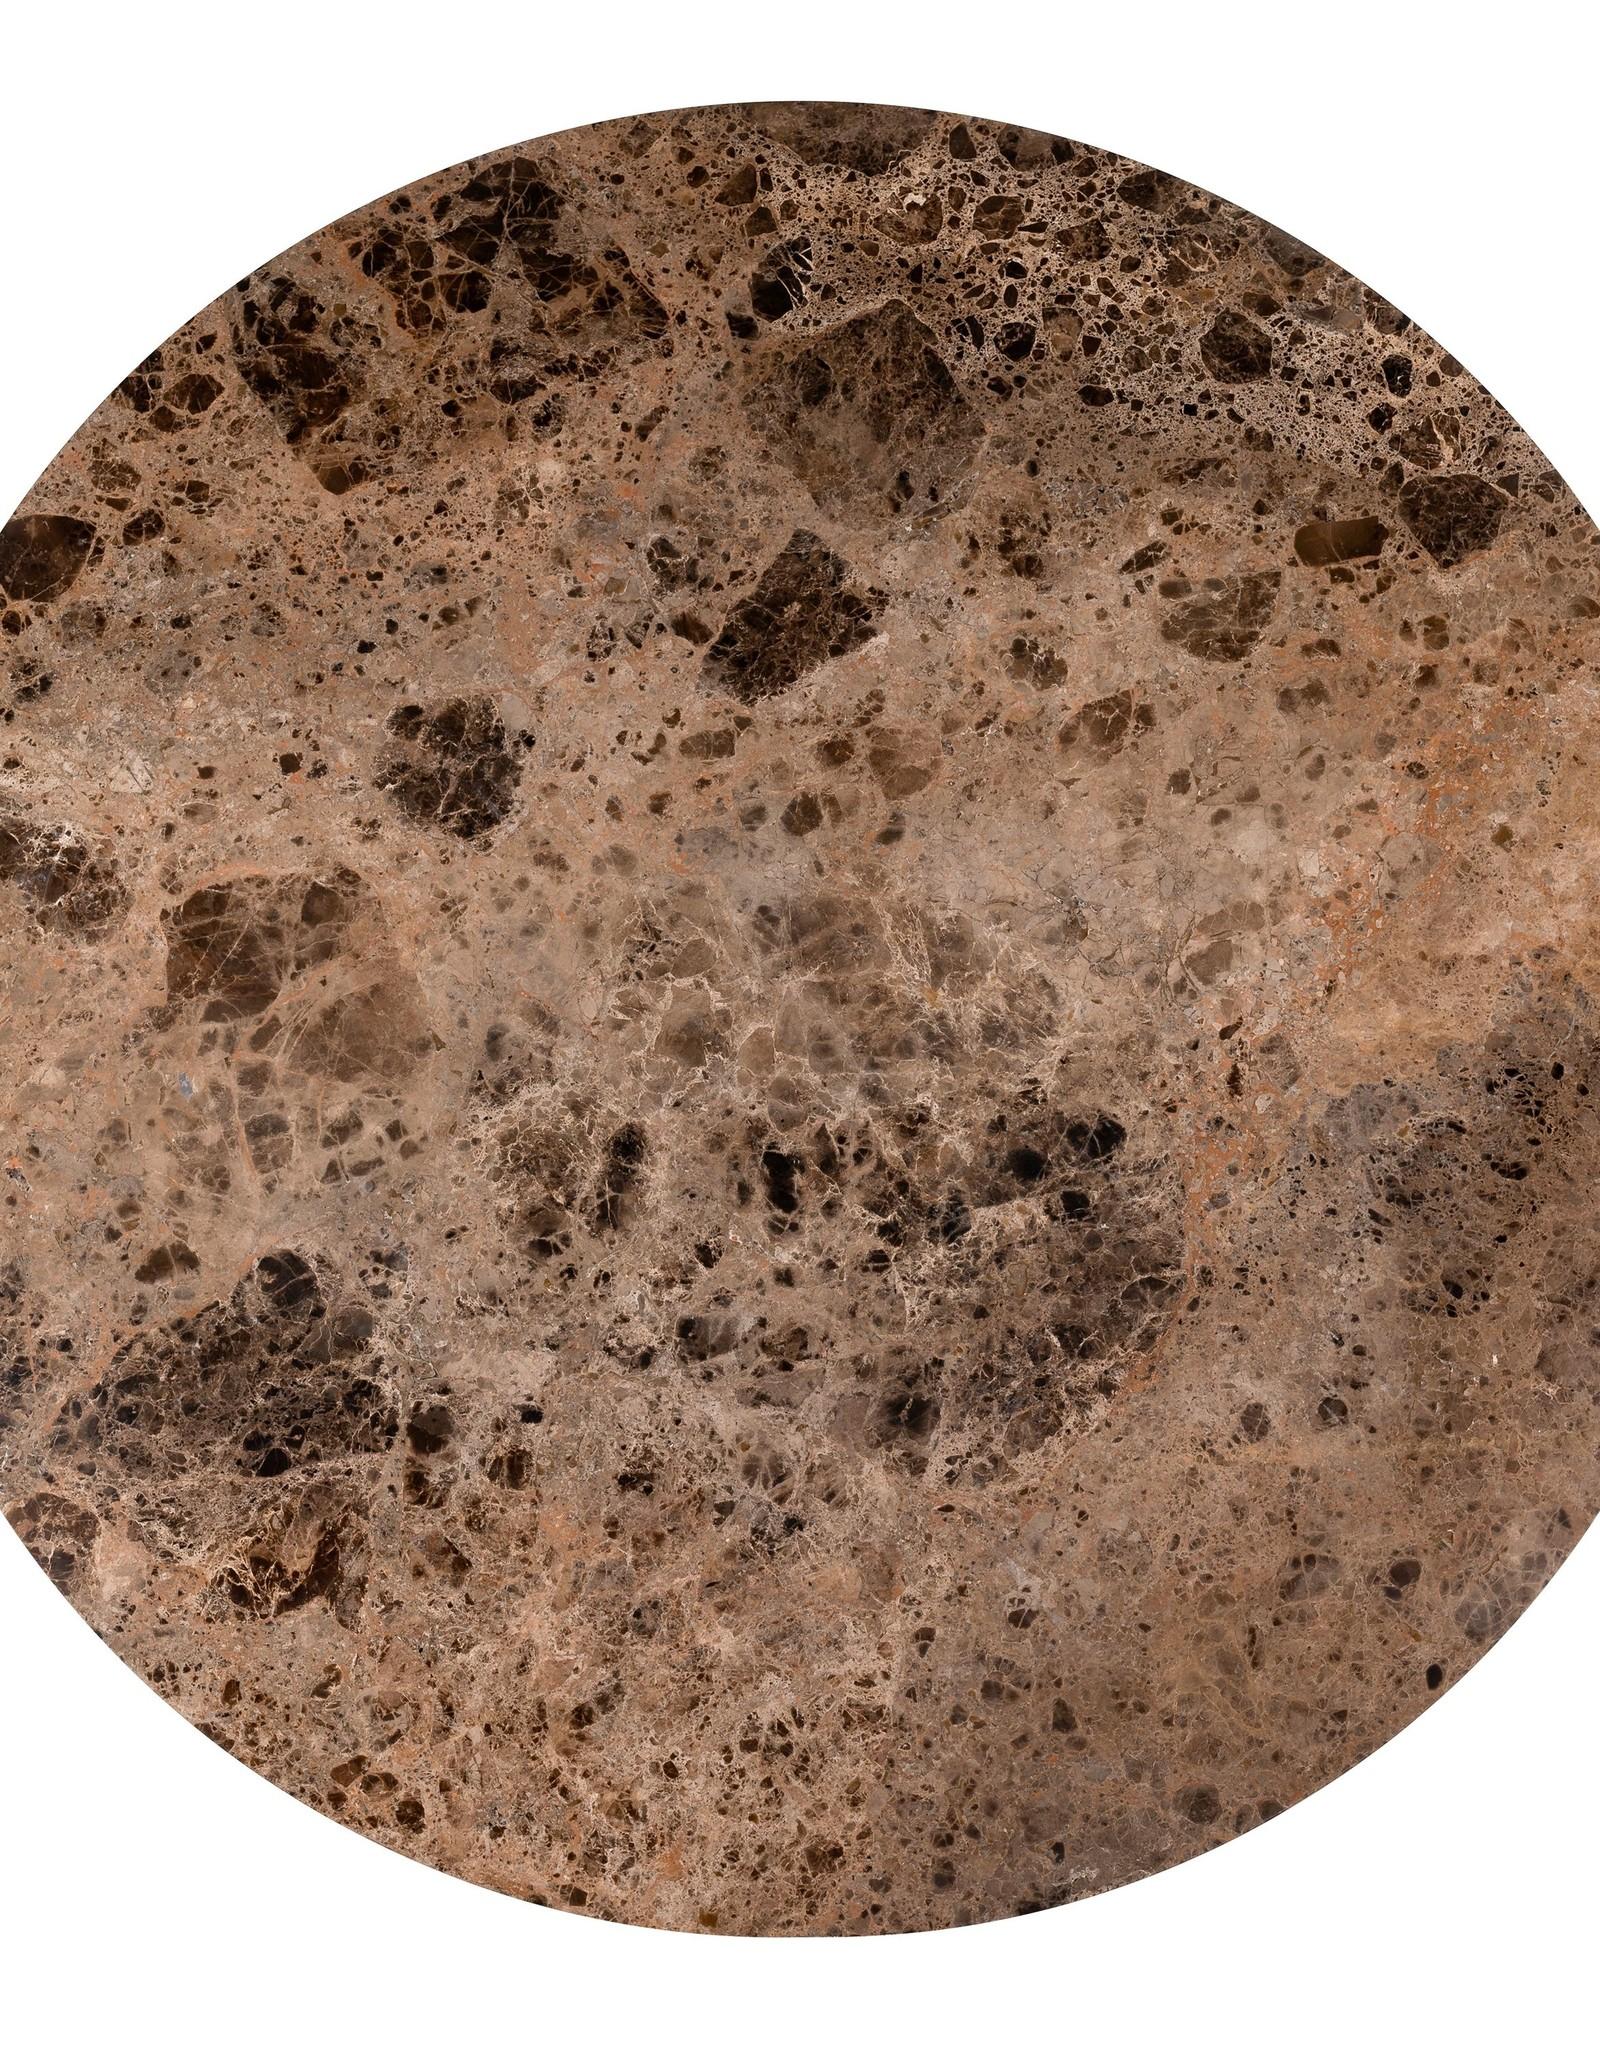 Richmond Interiors Eettafel Orion 140Ø met bruin marmer